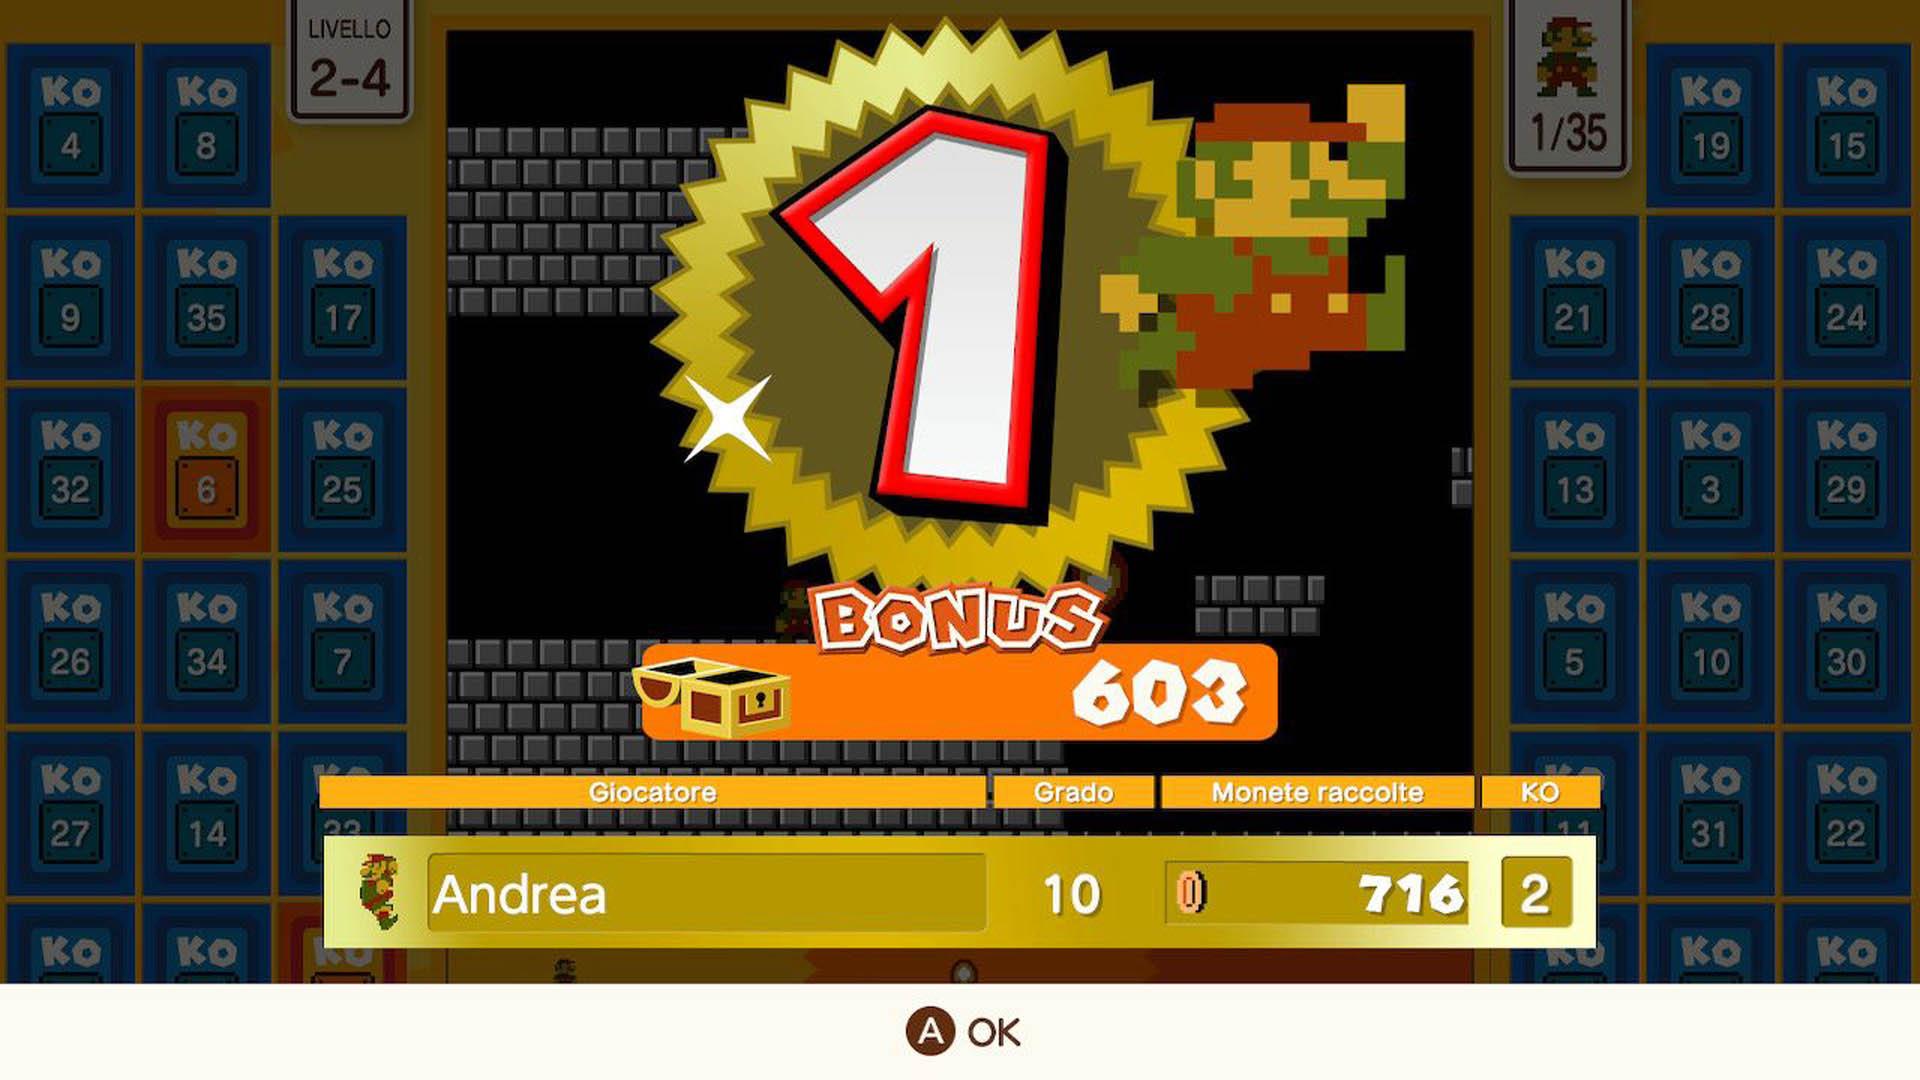 Super Mario Bros 35 trucchi per vincere